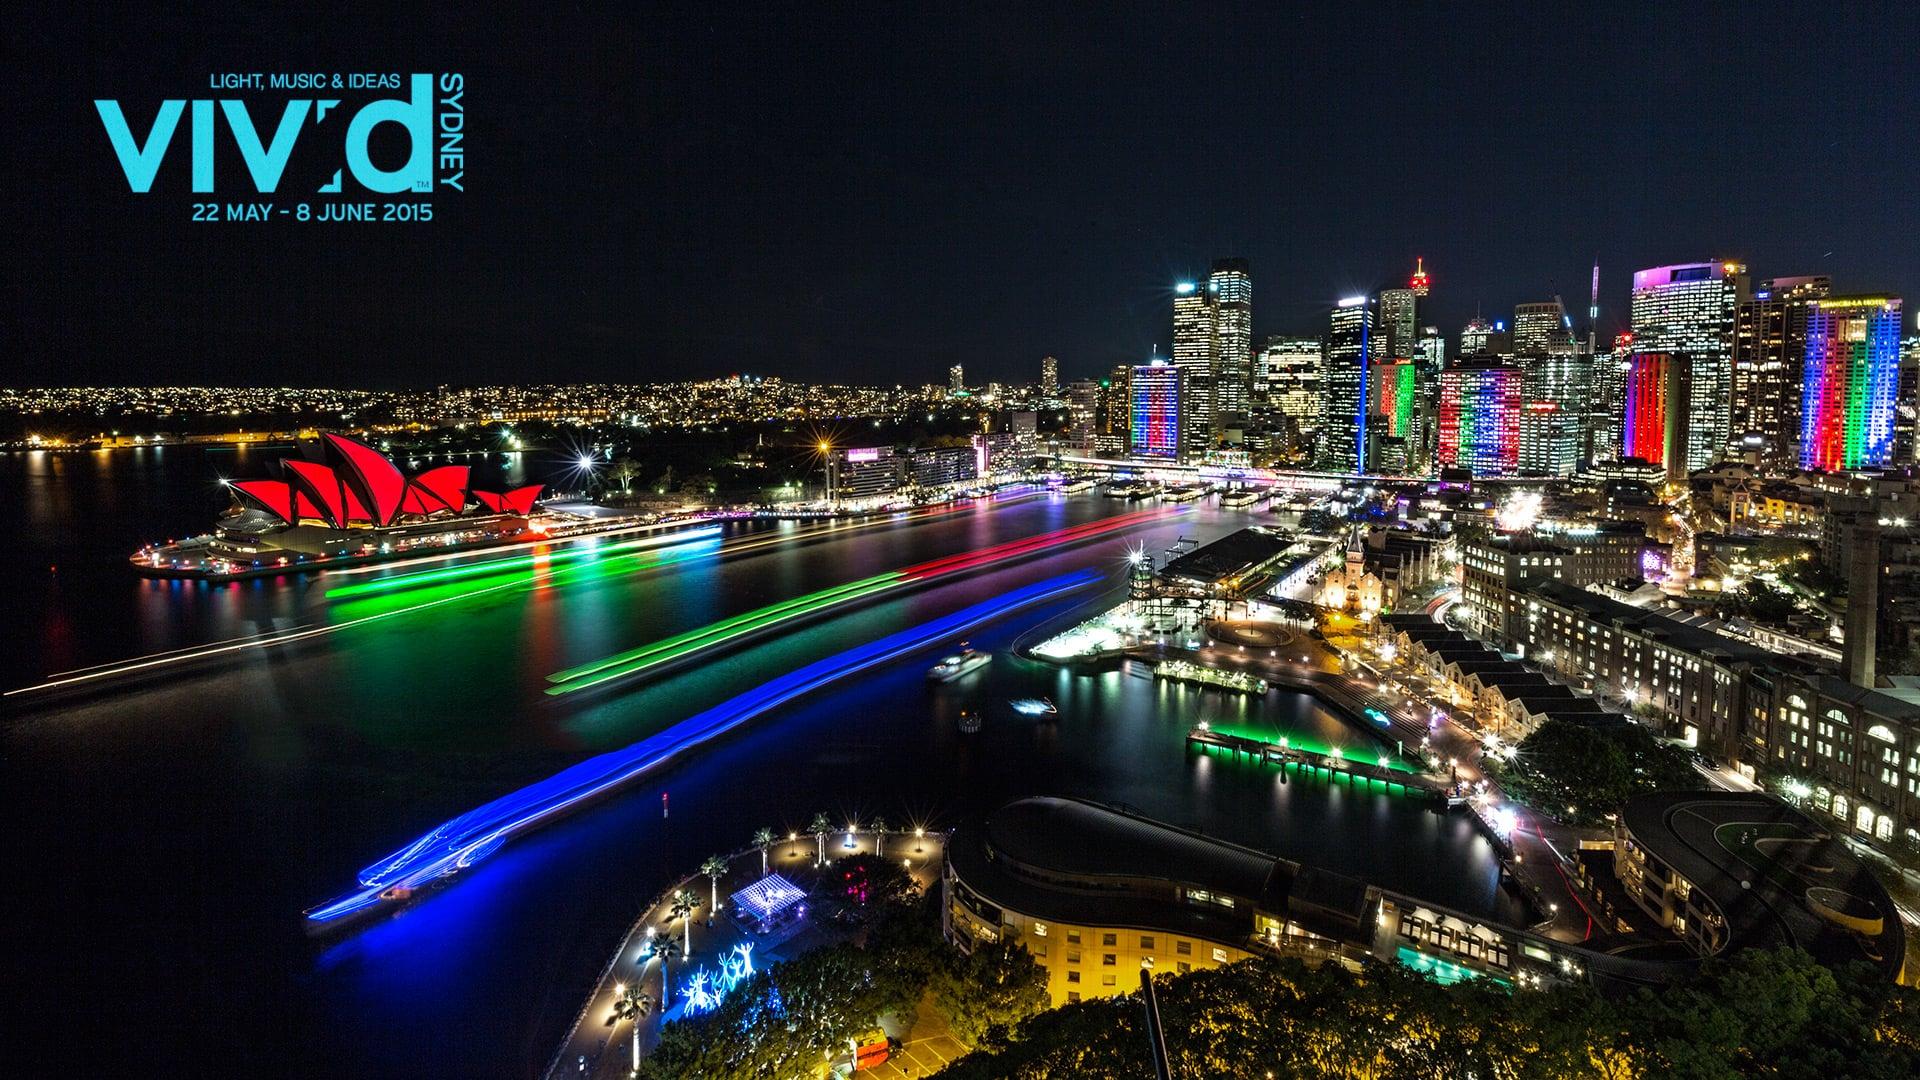 Vivid Sydney 2015 timelapses